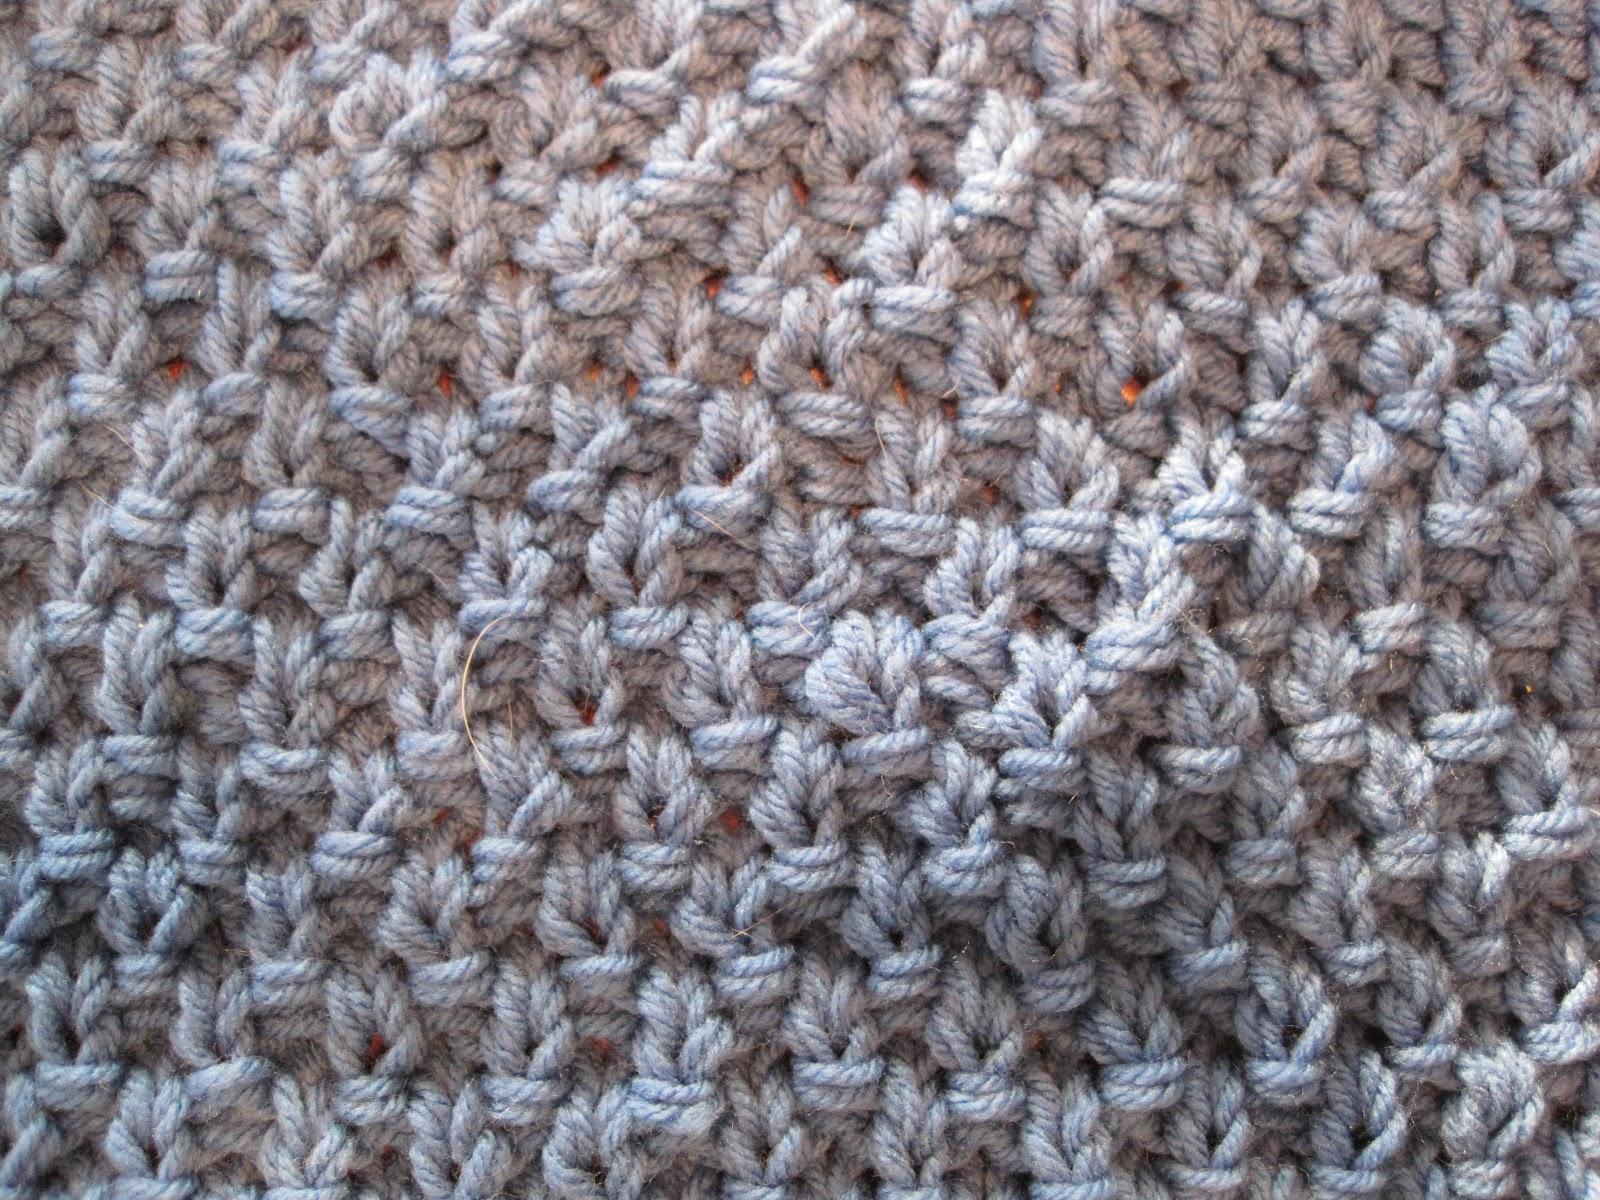 Knitting Blanket Moss Stitch : My Sampler Blanket